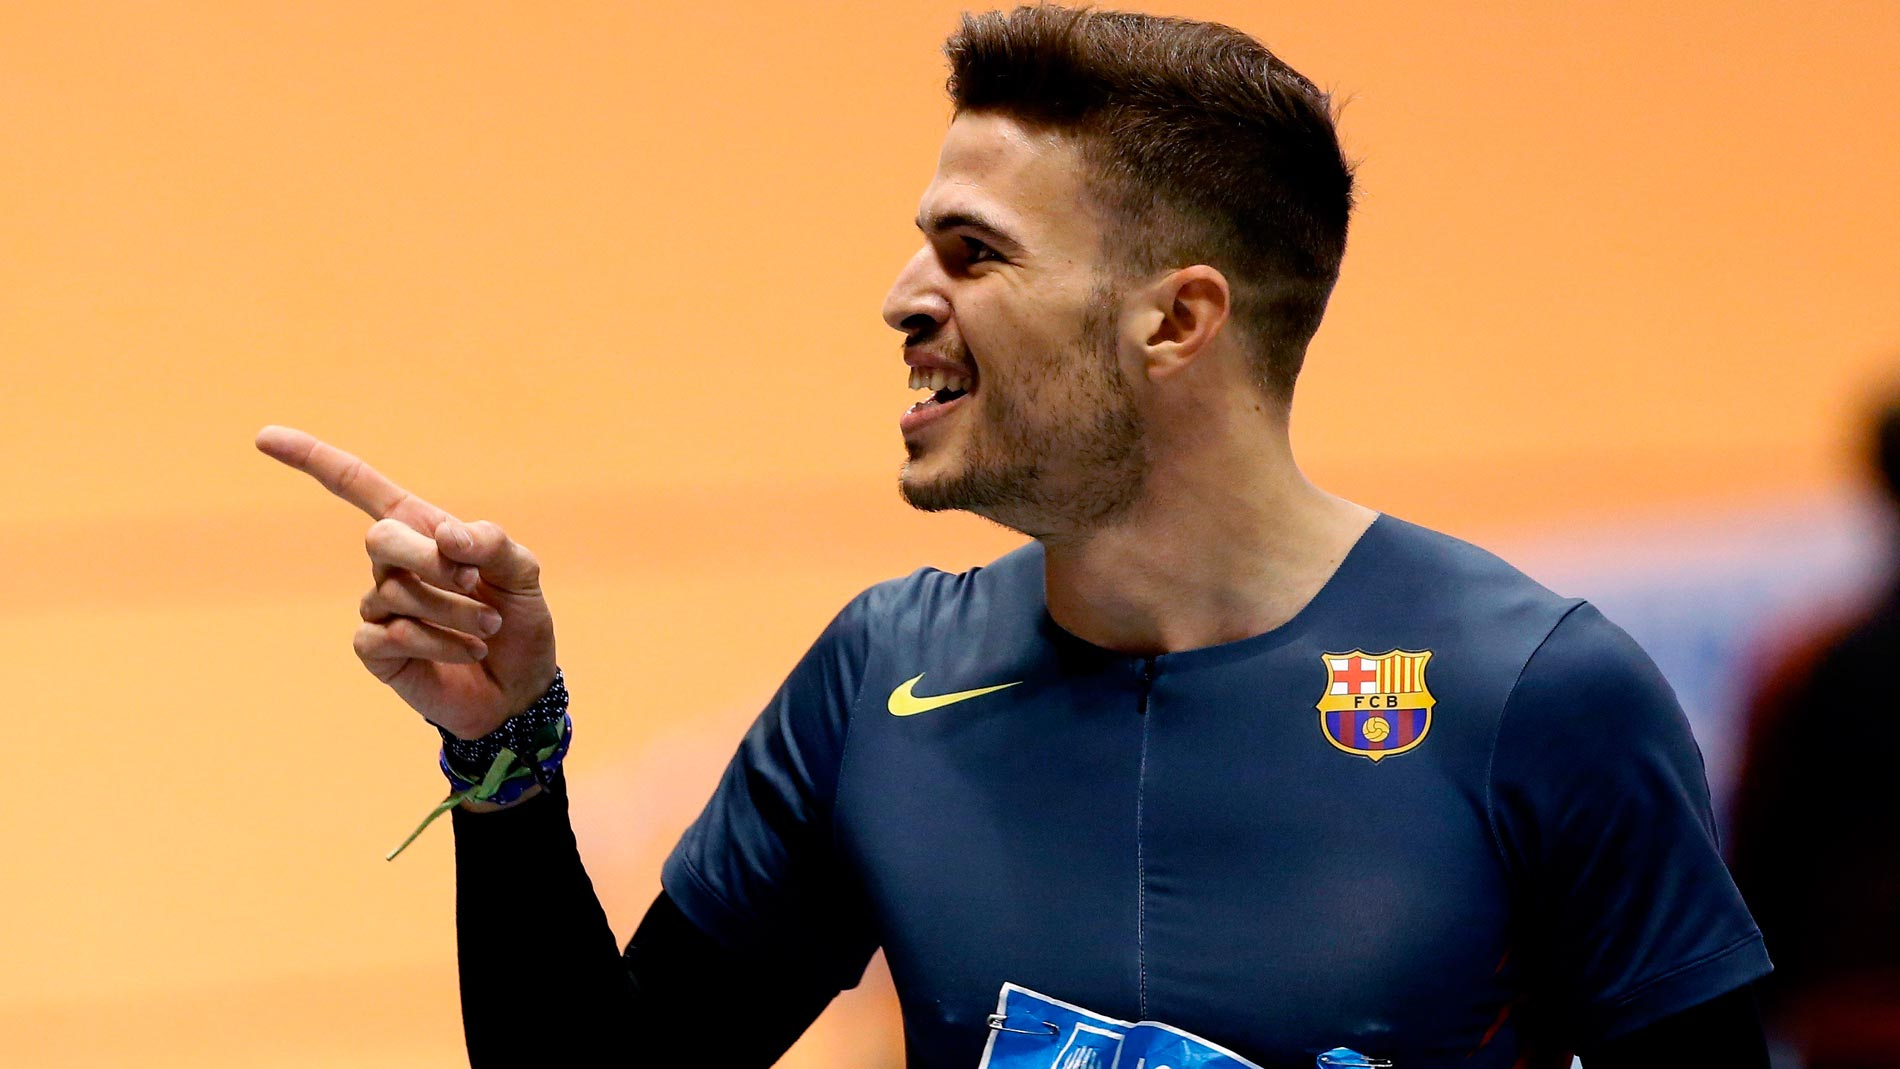 Husillos arrebata a Hortelano el récord de España de 200 en sala